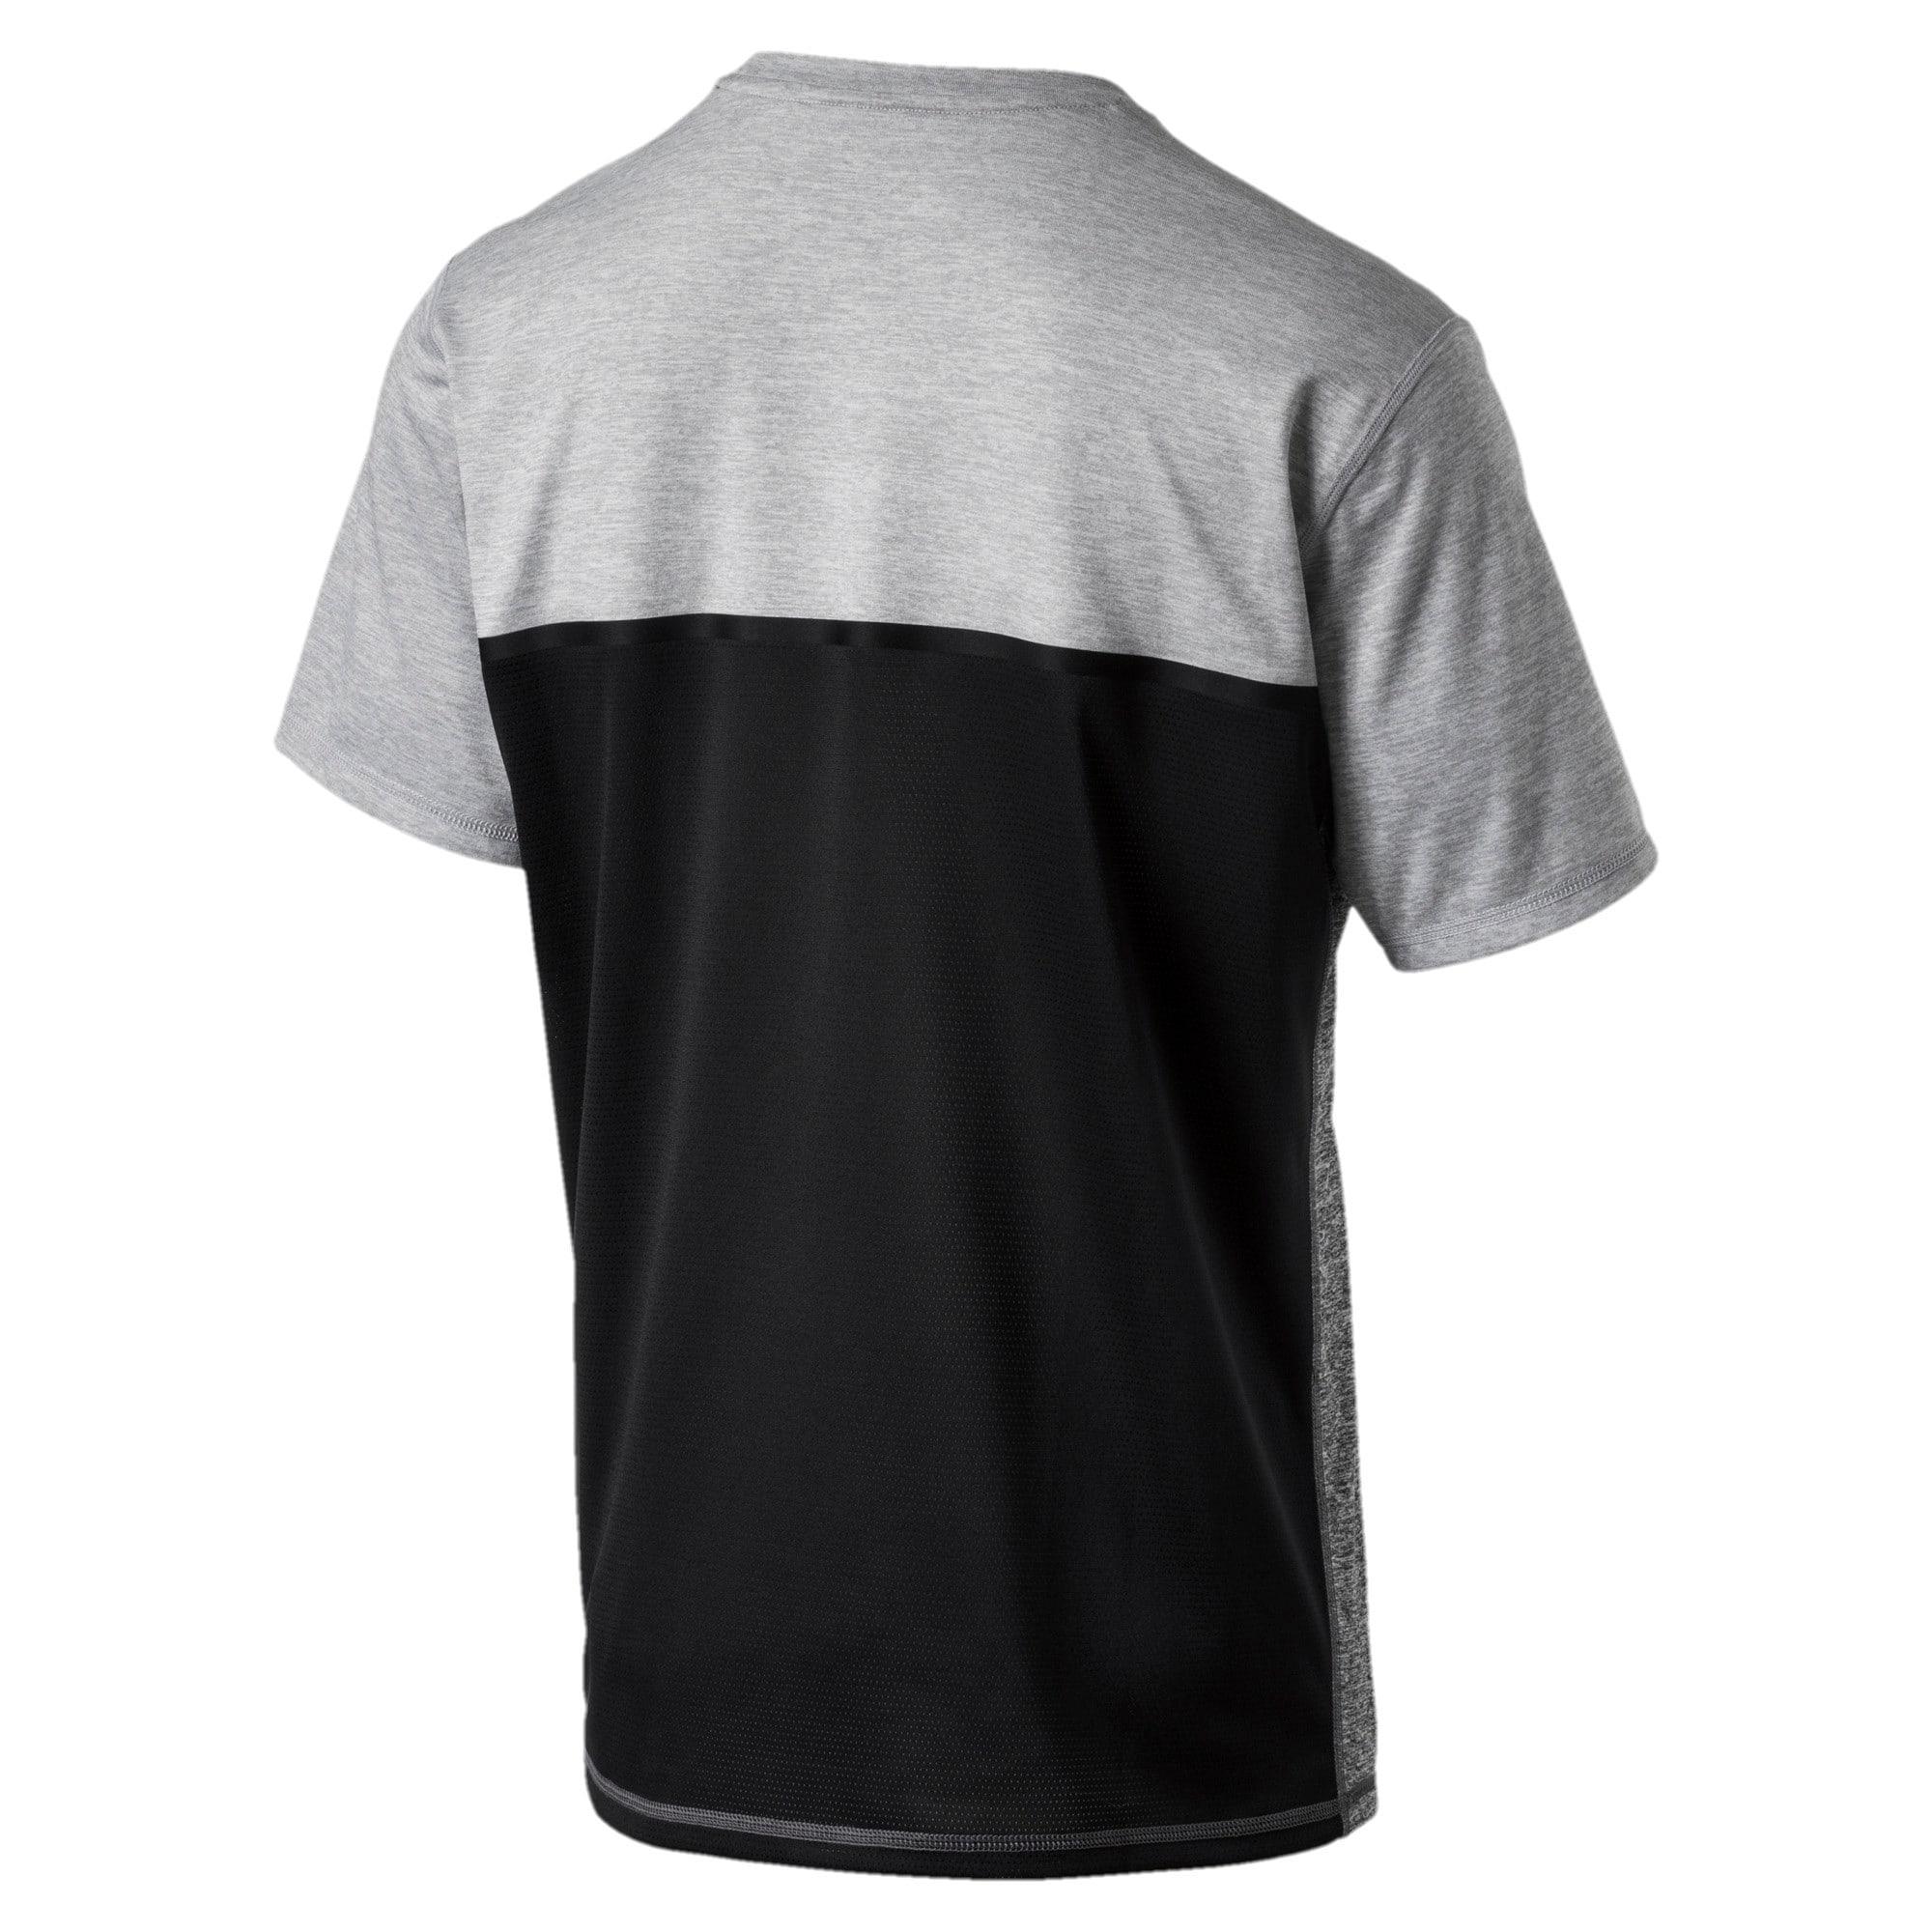 Thumbnail 4 of Active Training Men's Bonded Tech T-Shirt, Light GrayHthr-Dark GrayHthr, medium-IND